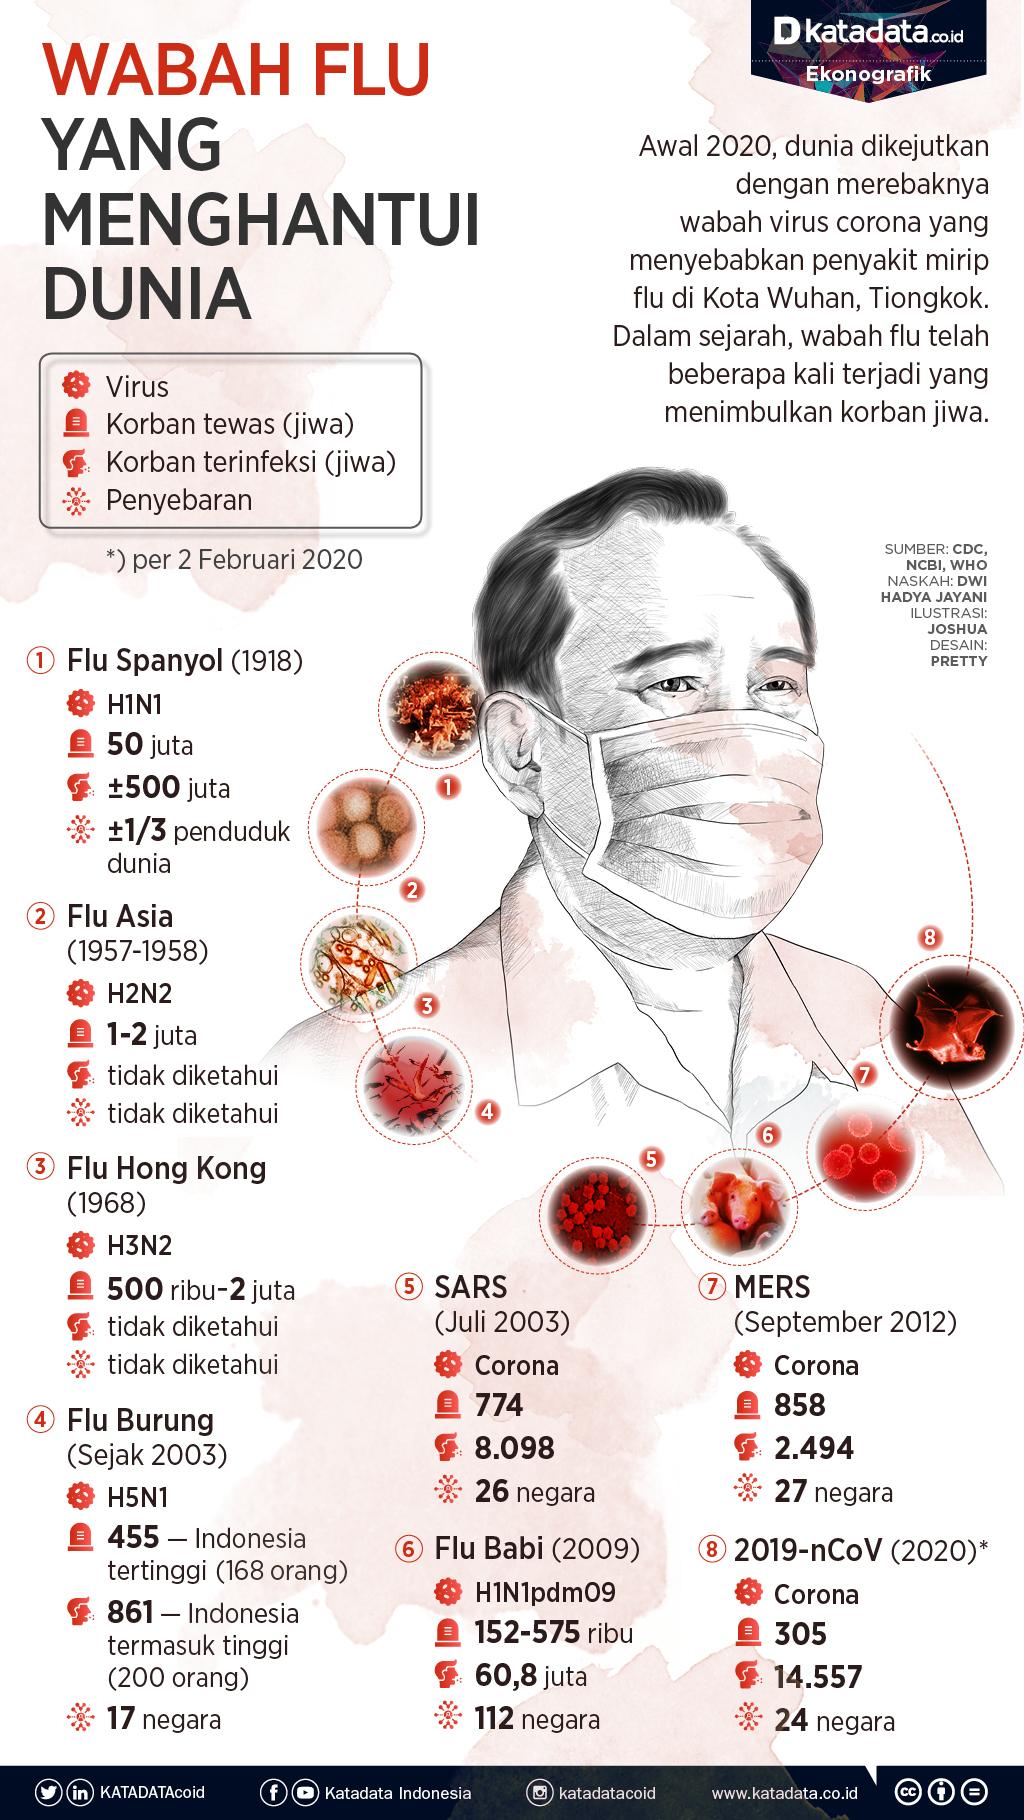 Wabah Flu yang Menghantui Dunia